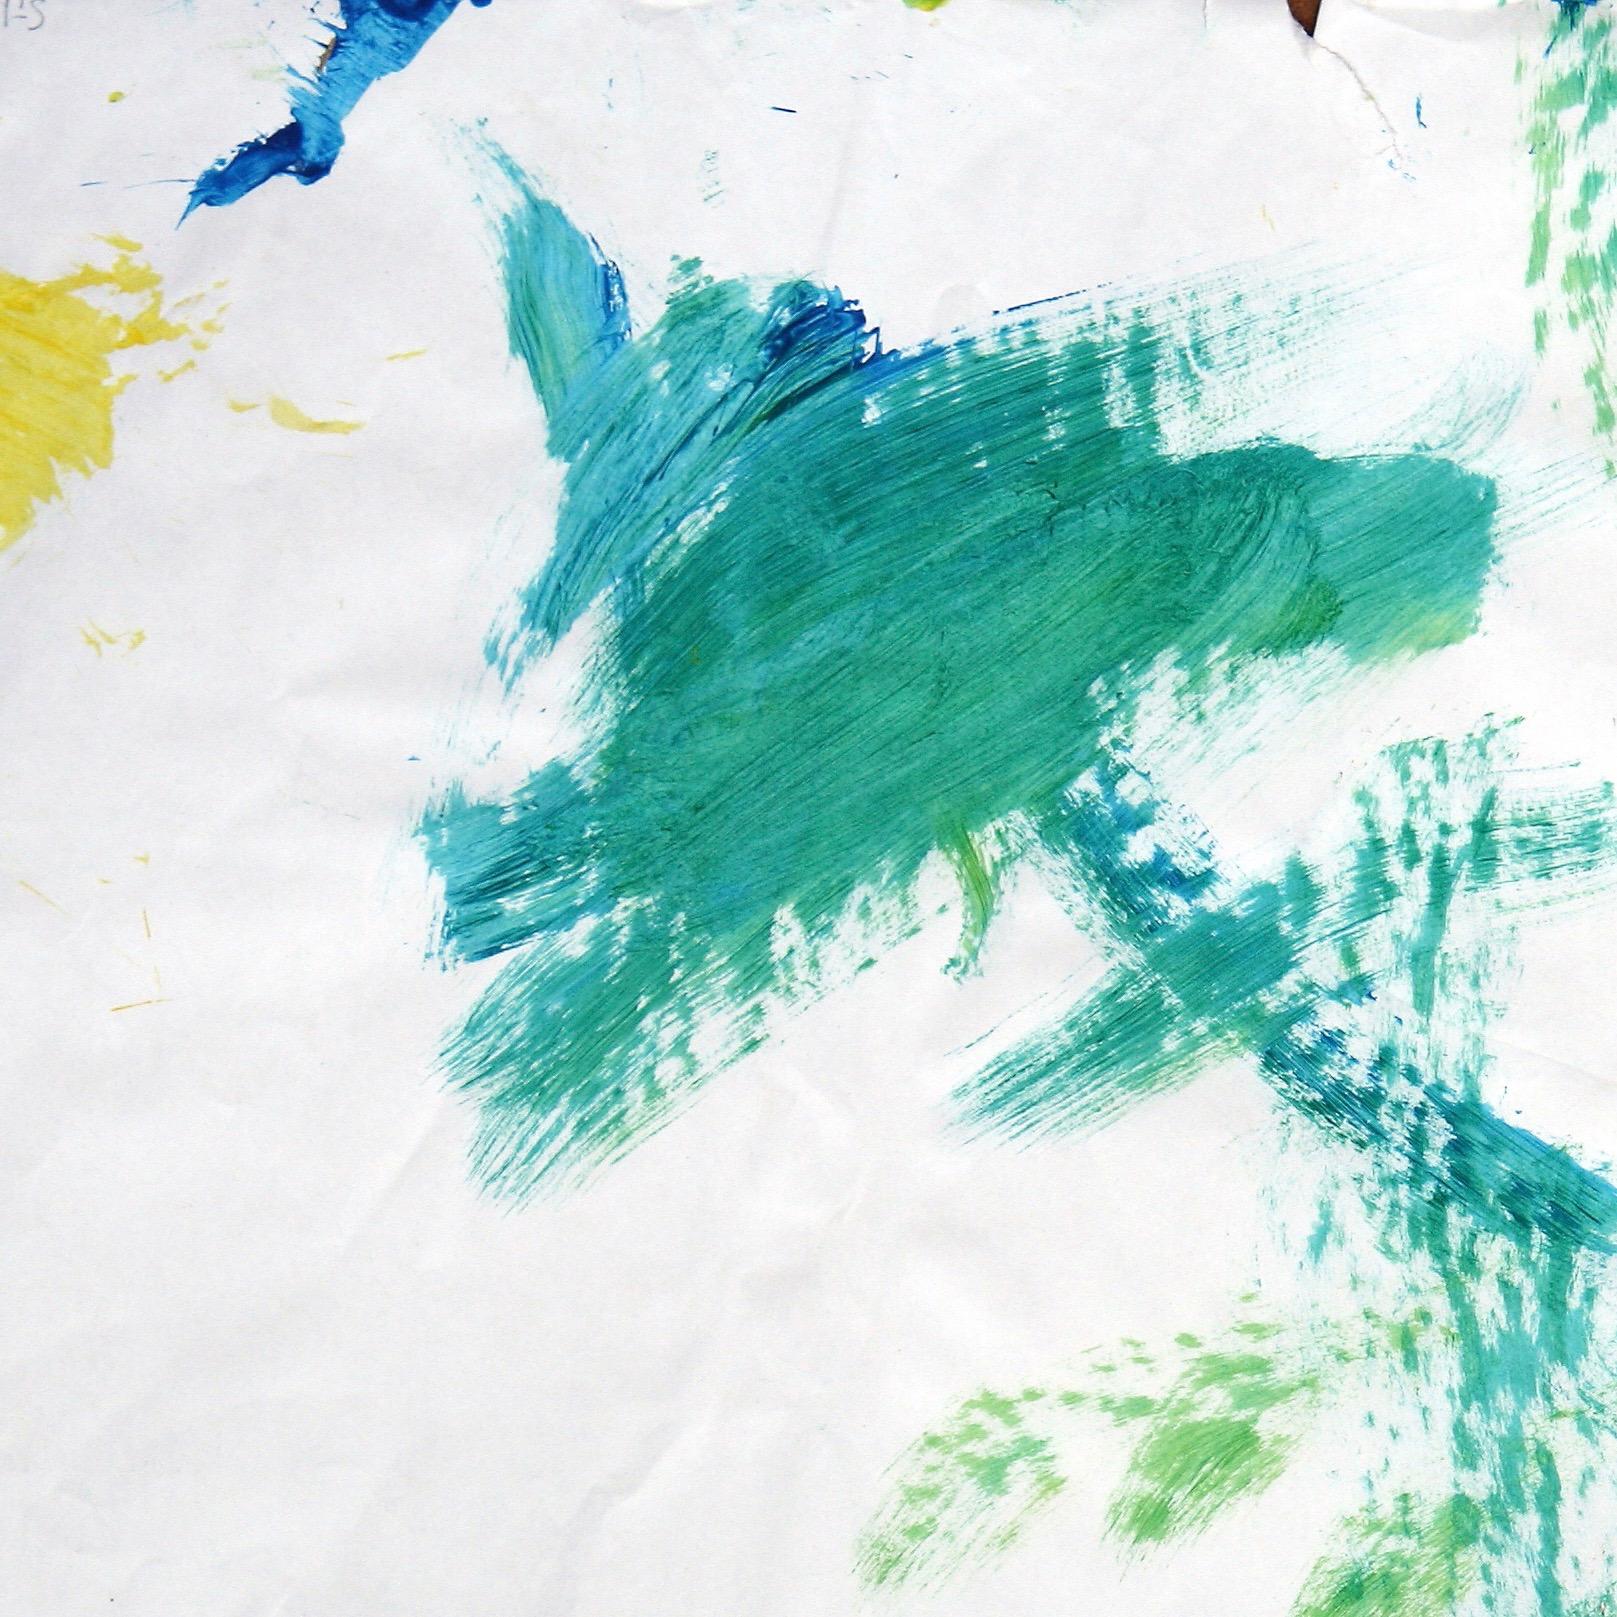 Sandra 0008, 2006, Fingerfarbe auf Papier, 41 x 42 cm